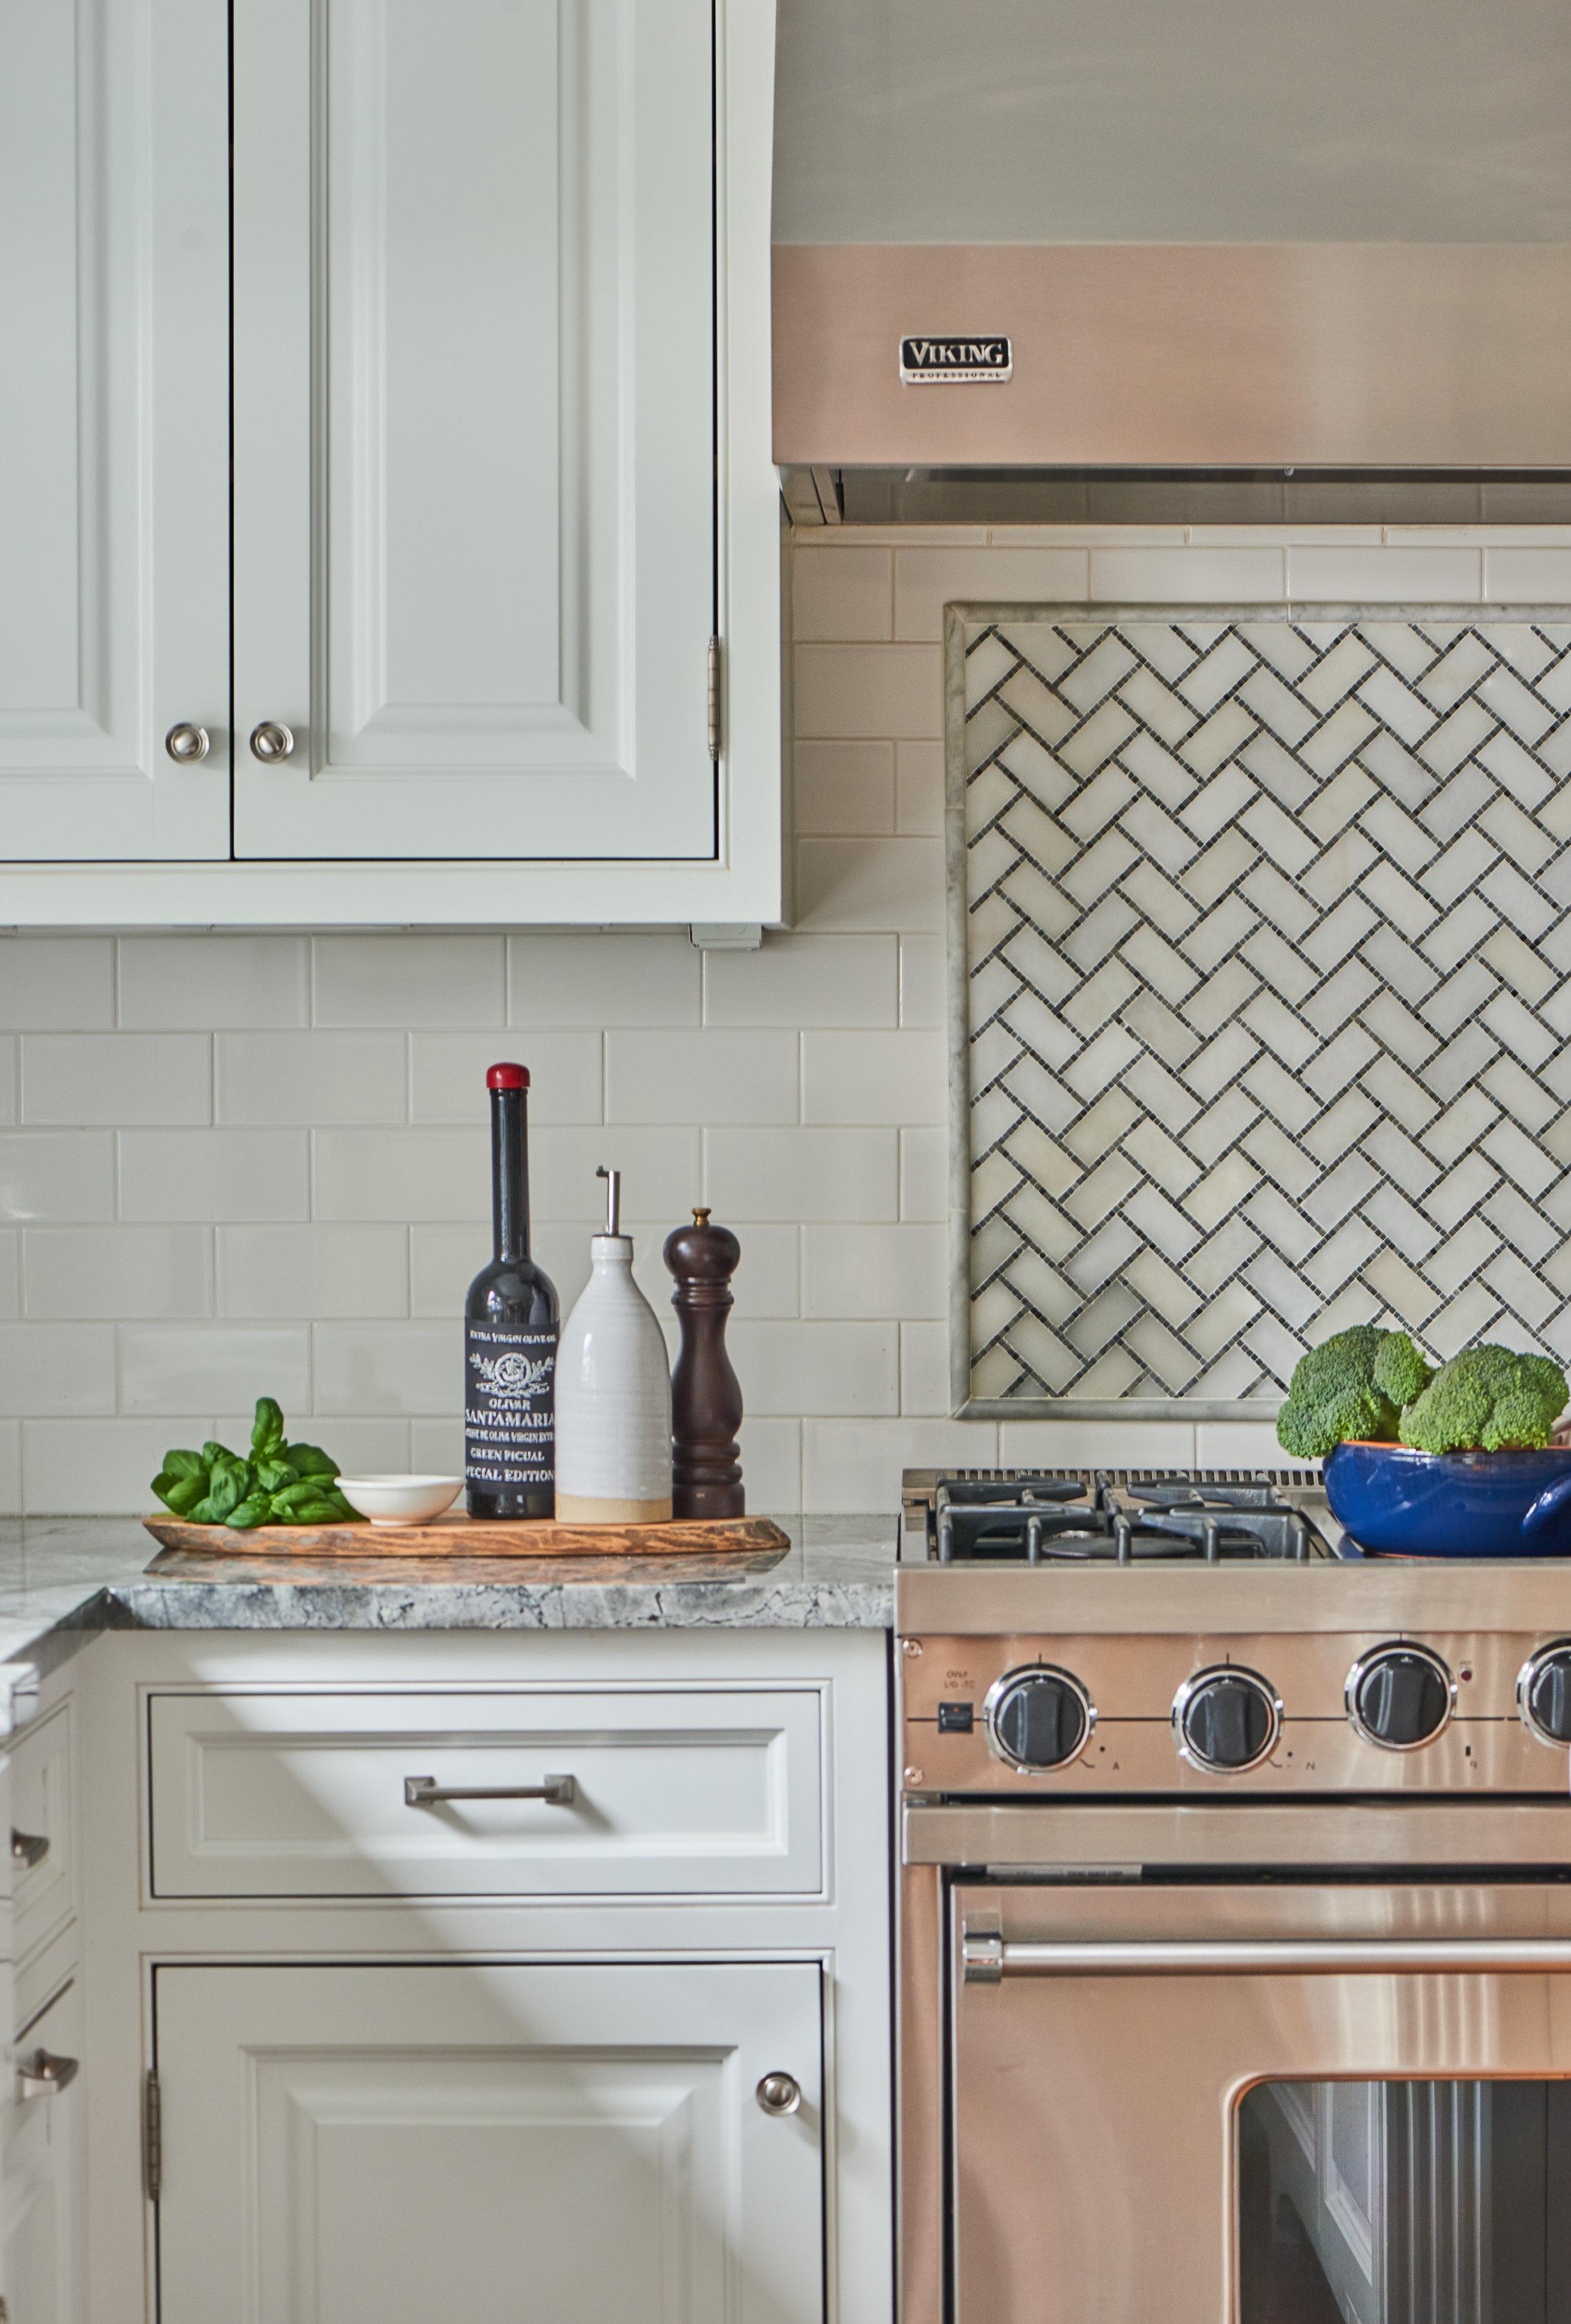 White marble with custom-tiled backsplash